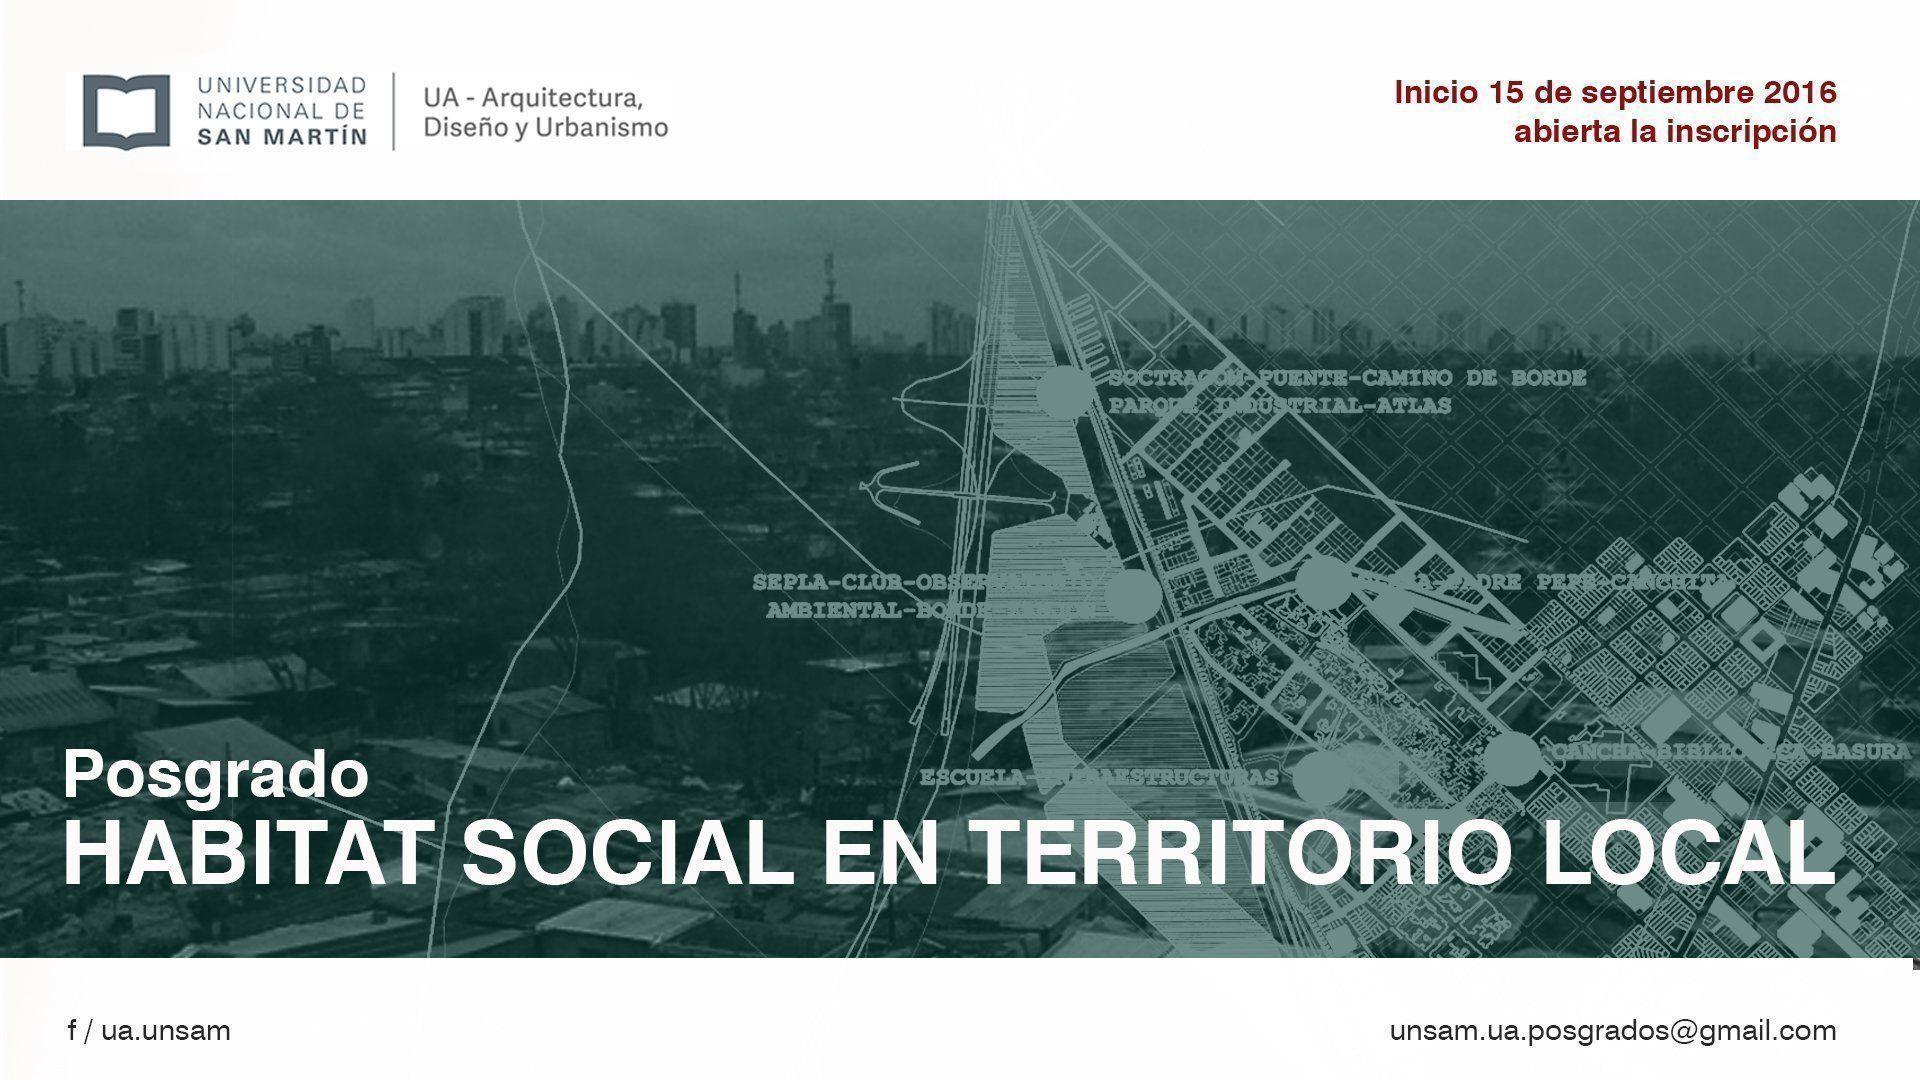 Posgrado: Hábitat social en territorio local